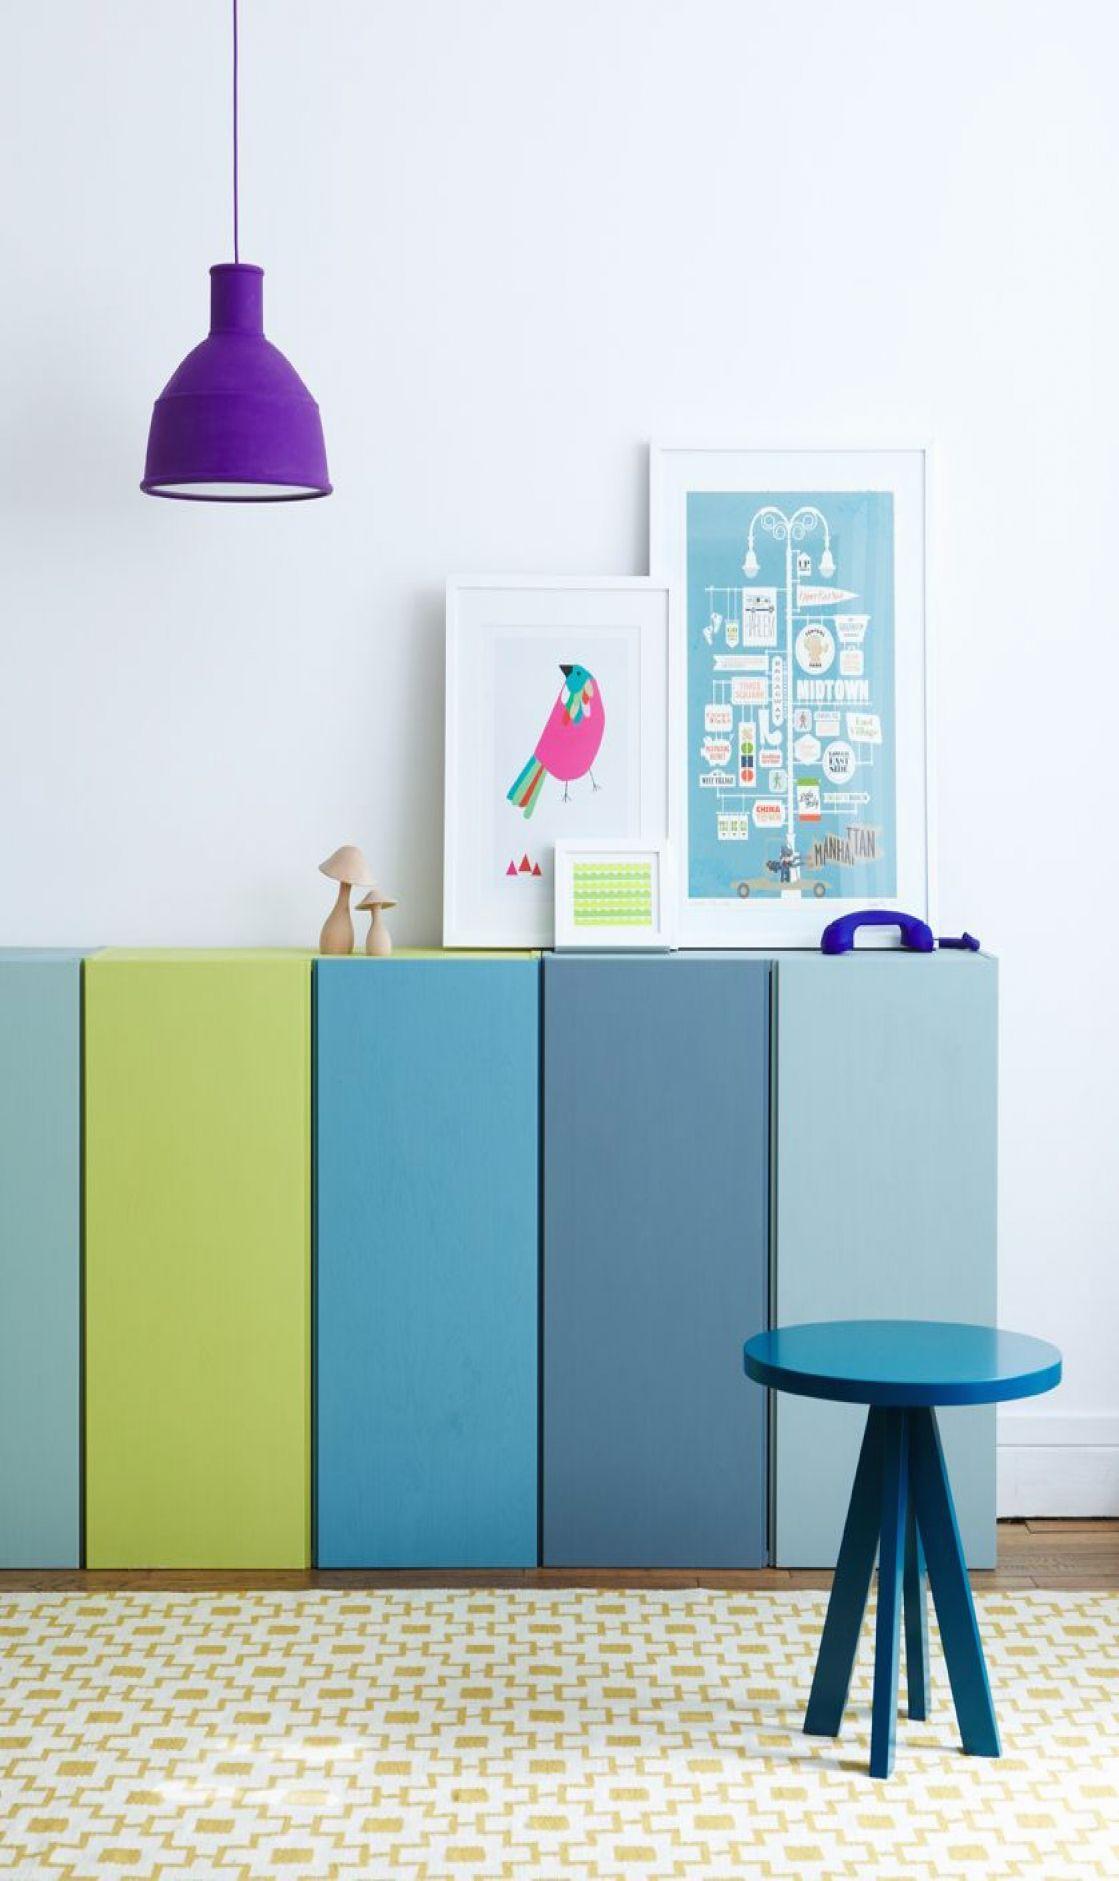 Kinderzimmer Schrank Ikea Ikea Hacks Ivar Schranktüren In